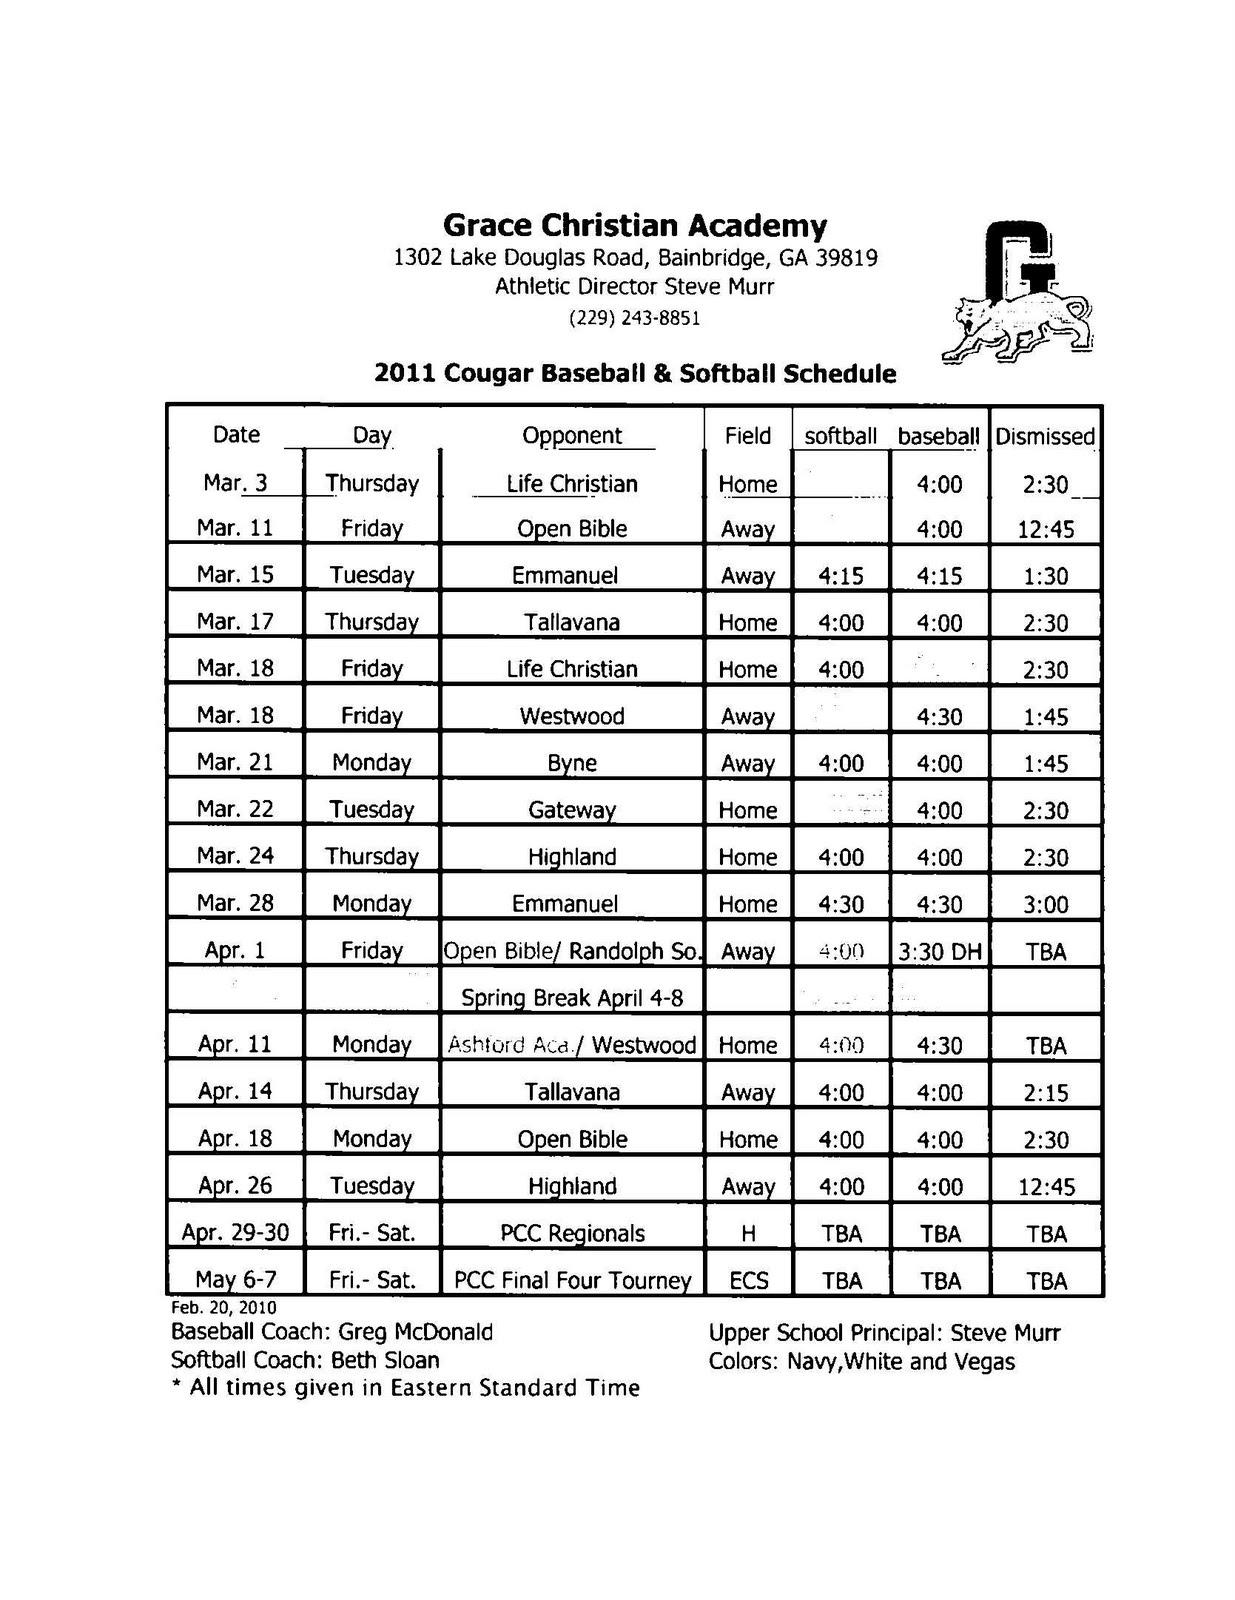 Grace Christian Academy: 2011 Baseball/Softball Schedule